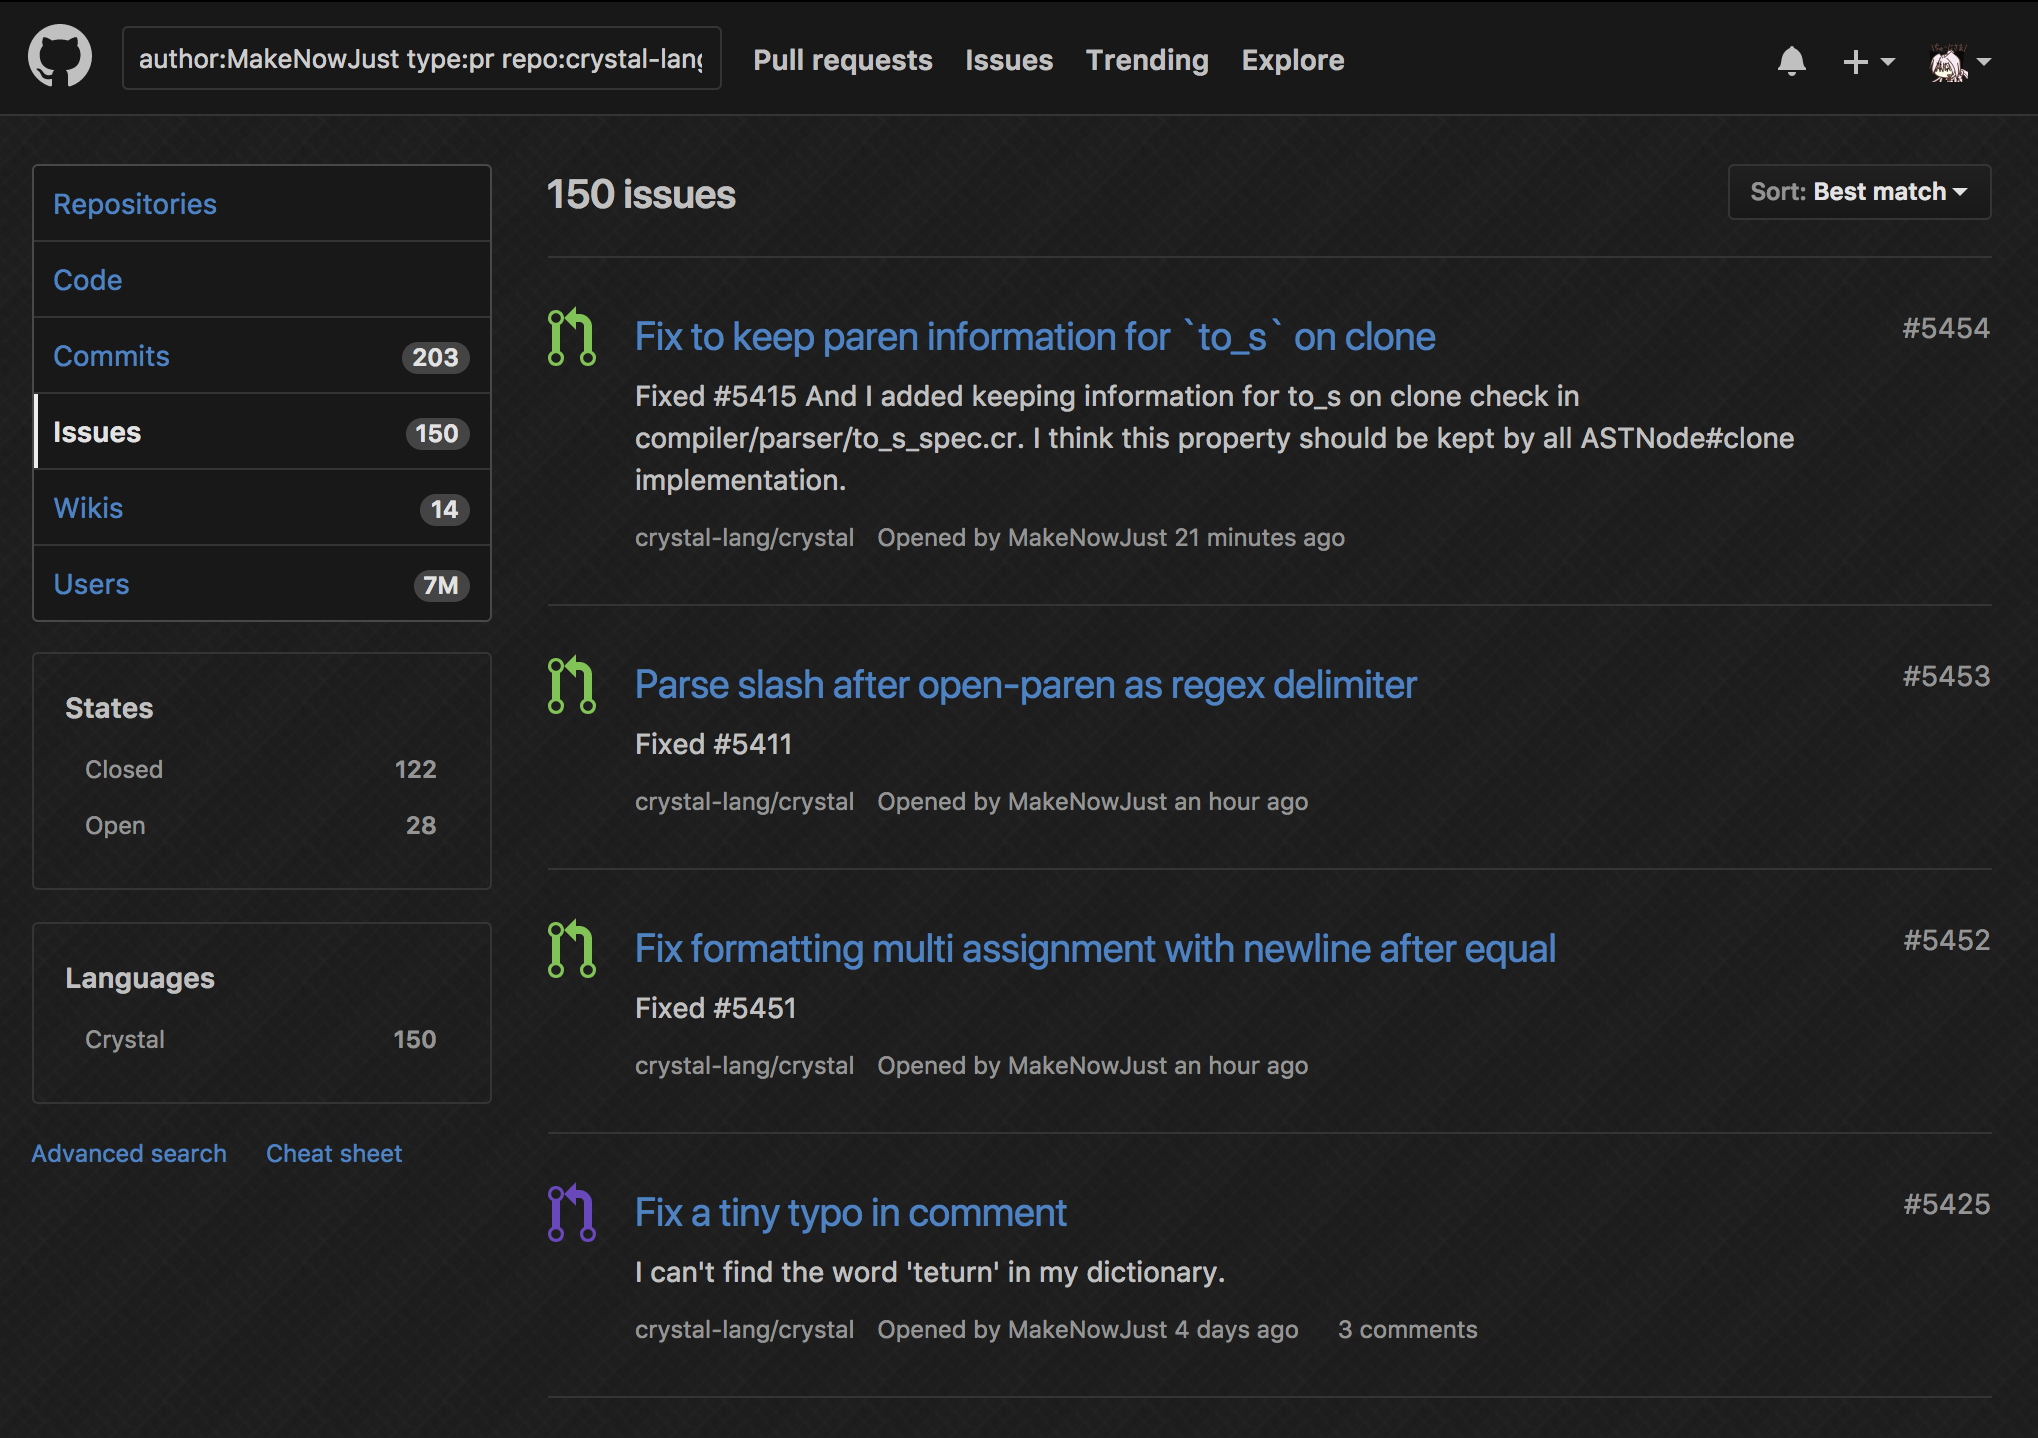 GitHubの検索結果のスクショ